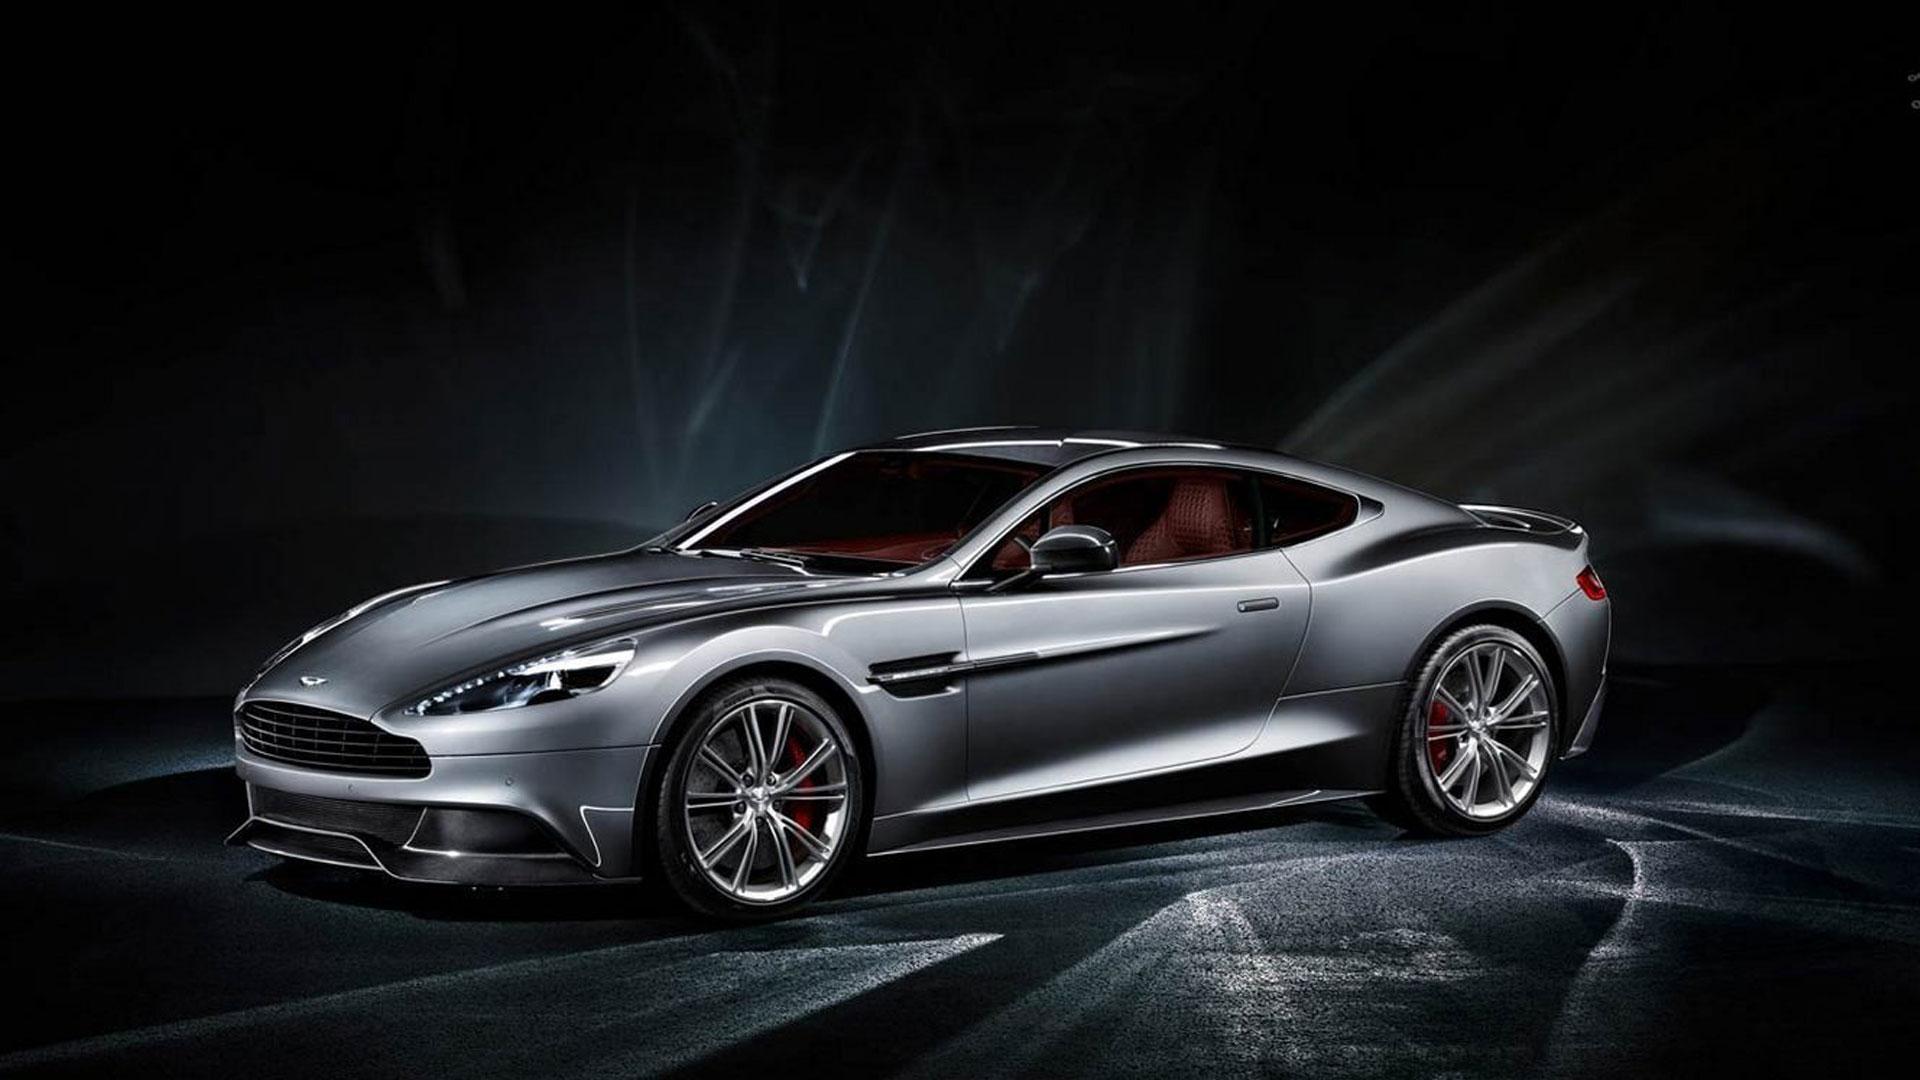 2014 Aston Martin Vanquish 34 Car Background